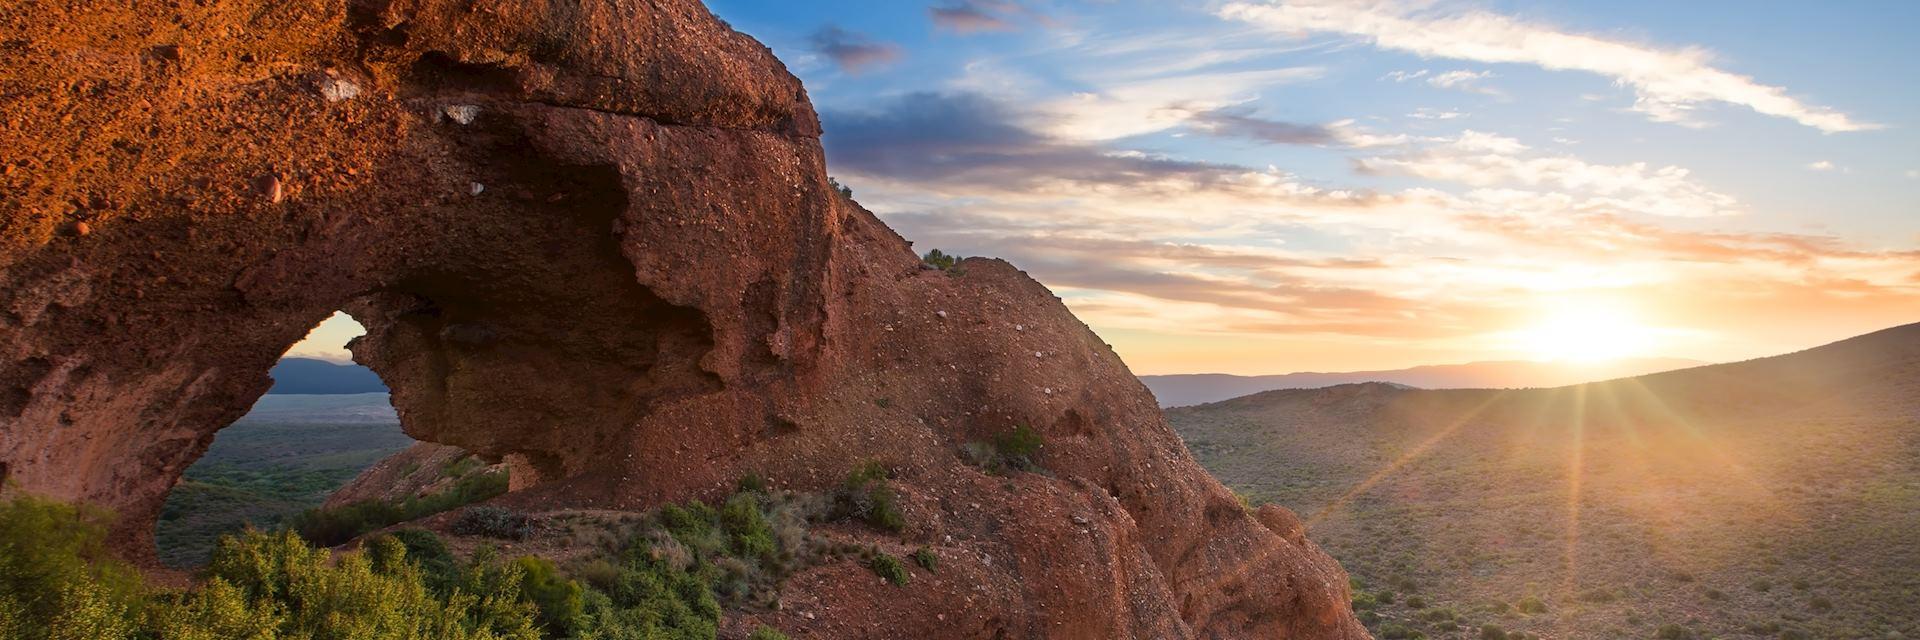 Red Rock Mountain near Calitzdorp